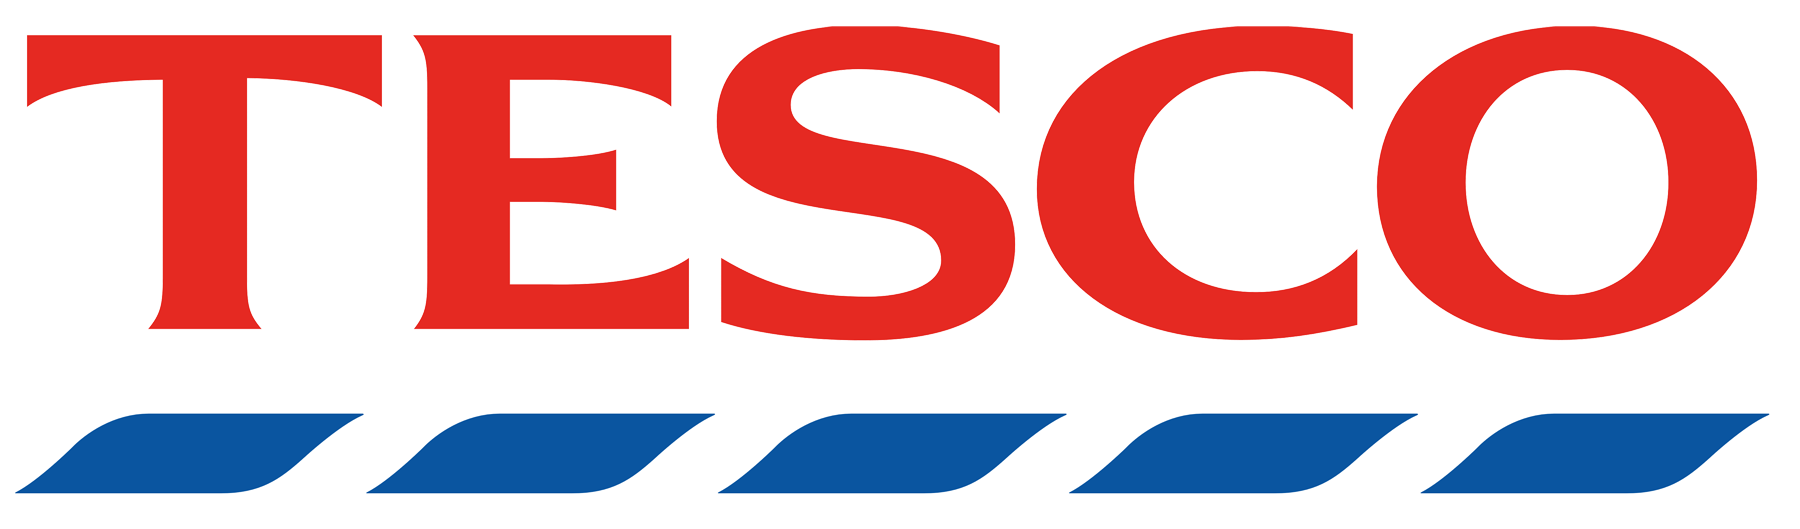 Tesco Bank Home Insureance